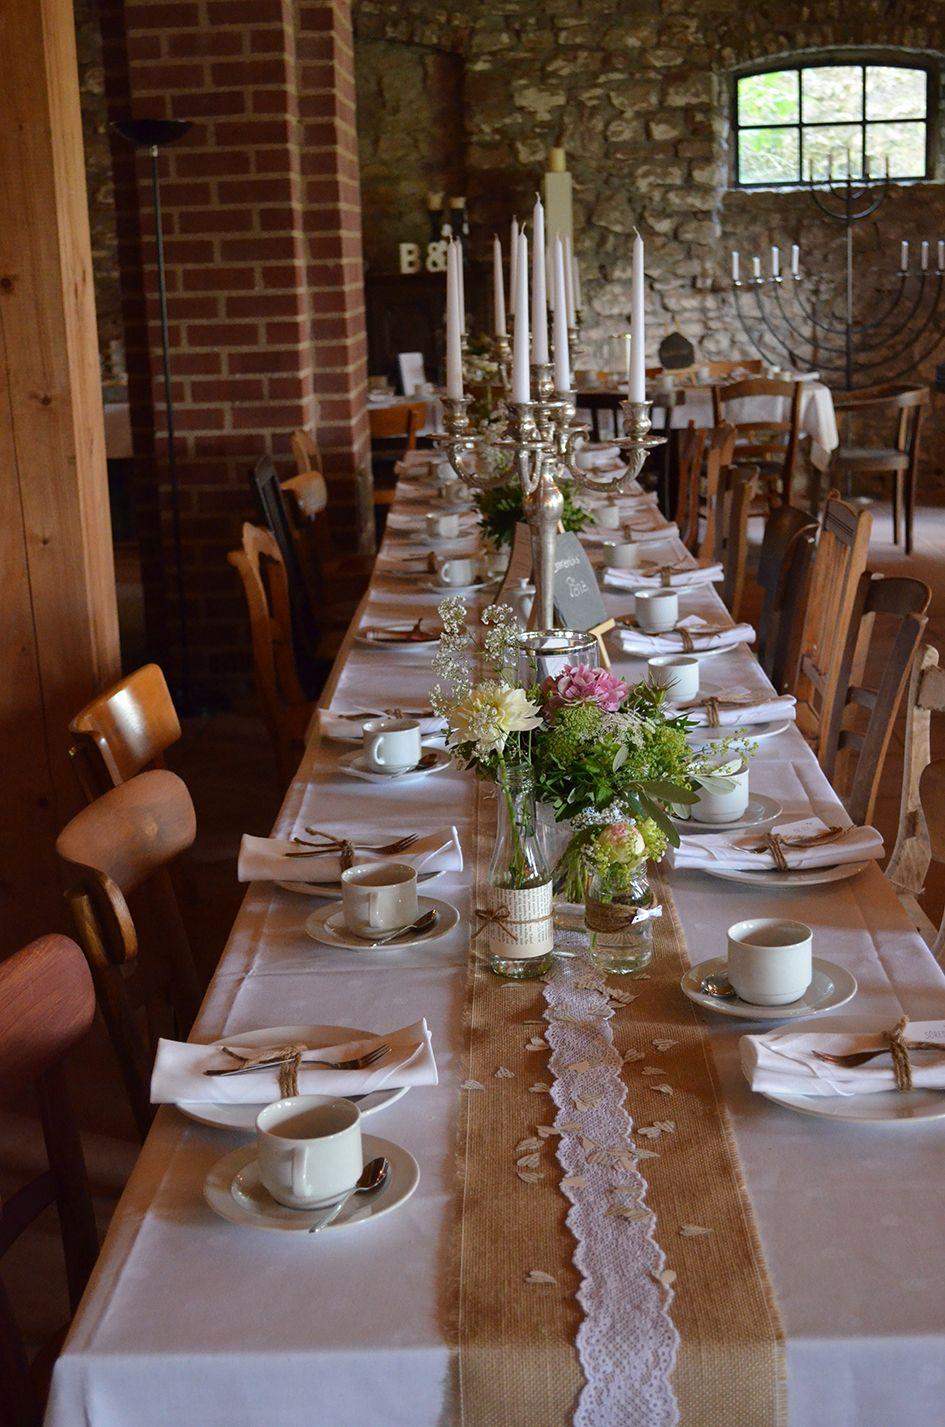 Hochzeitsdeko Rustikal hochzeitsdeko rustikal tischdeko rustic wedding decoration